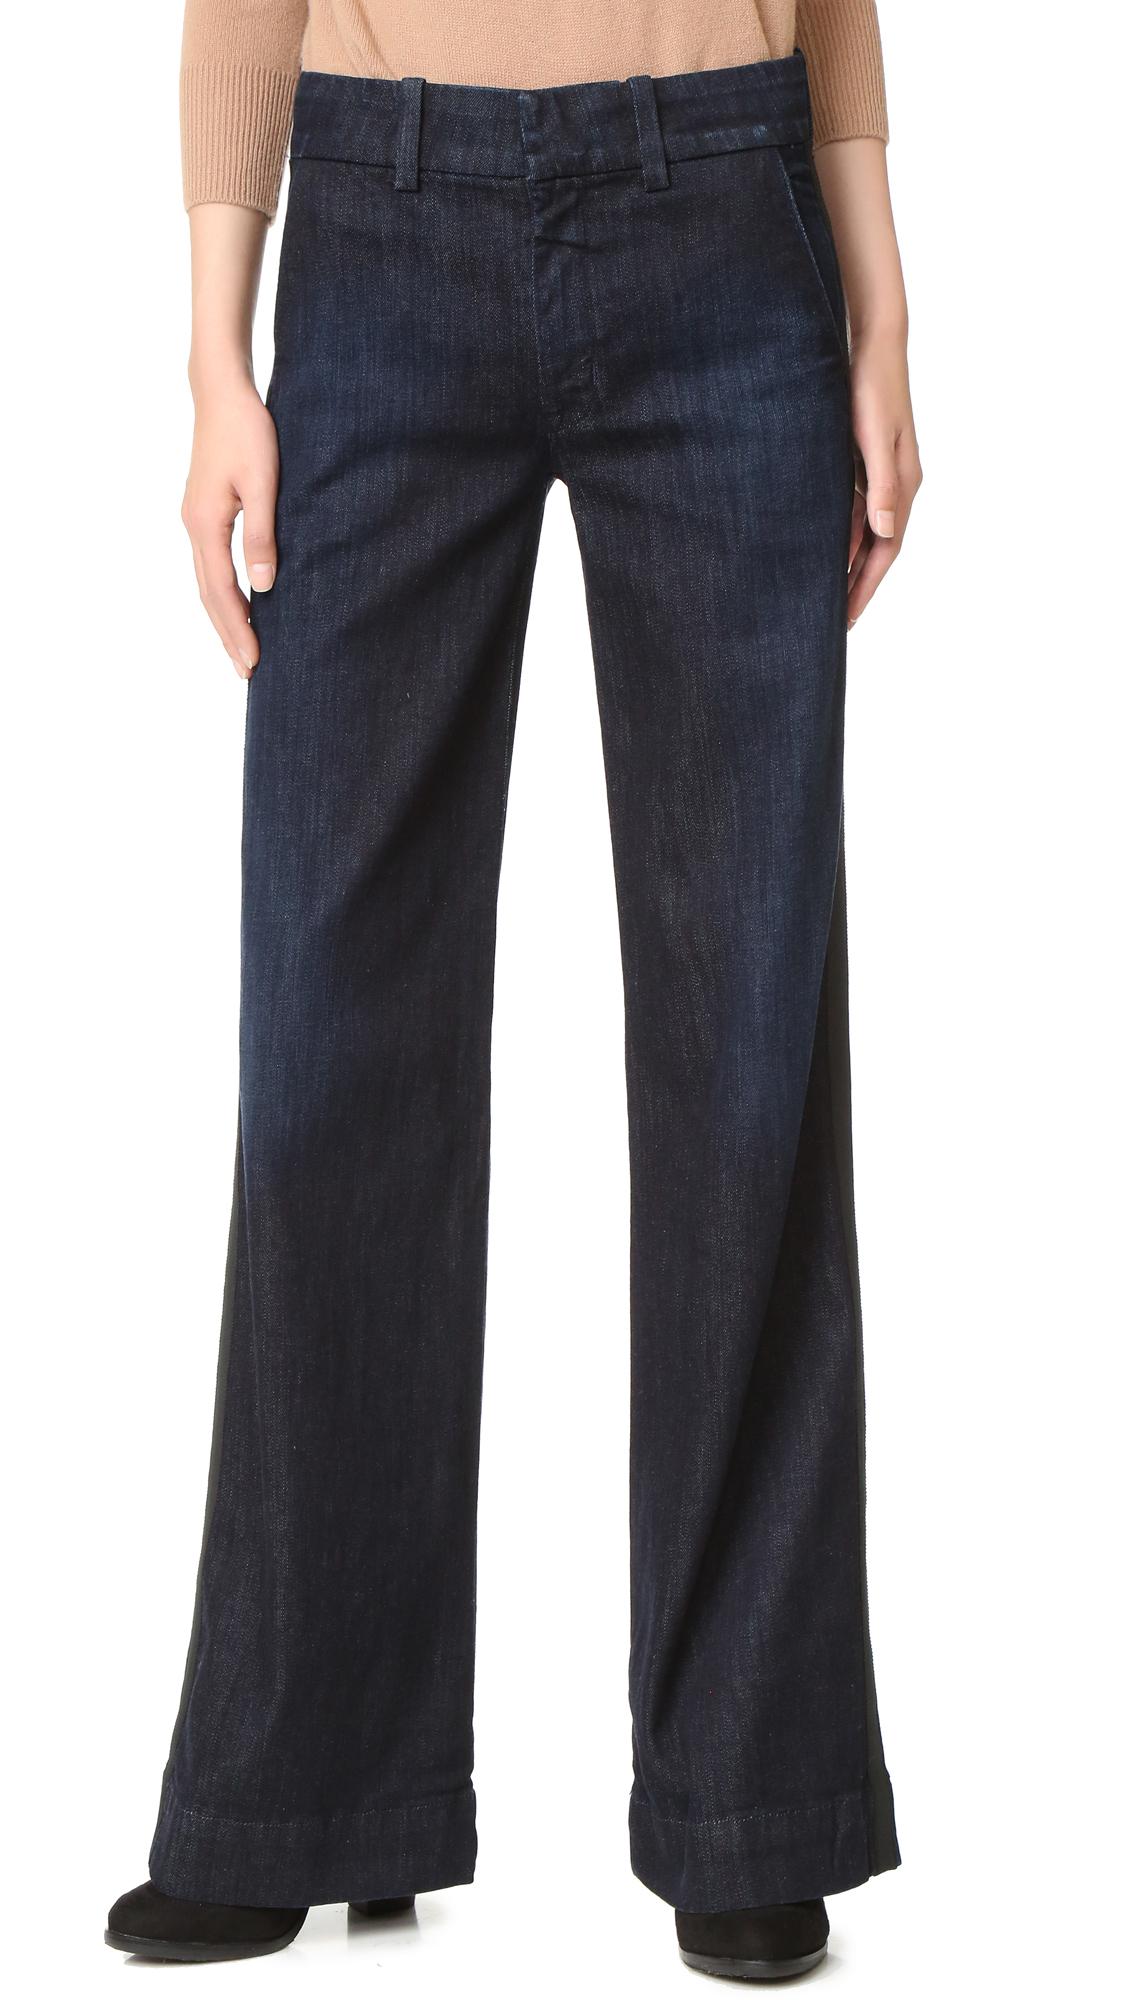 Hudson Joplin Wide Leg Trouser Jeans - Novice 2 at Shopbop